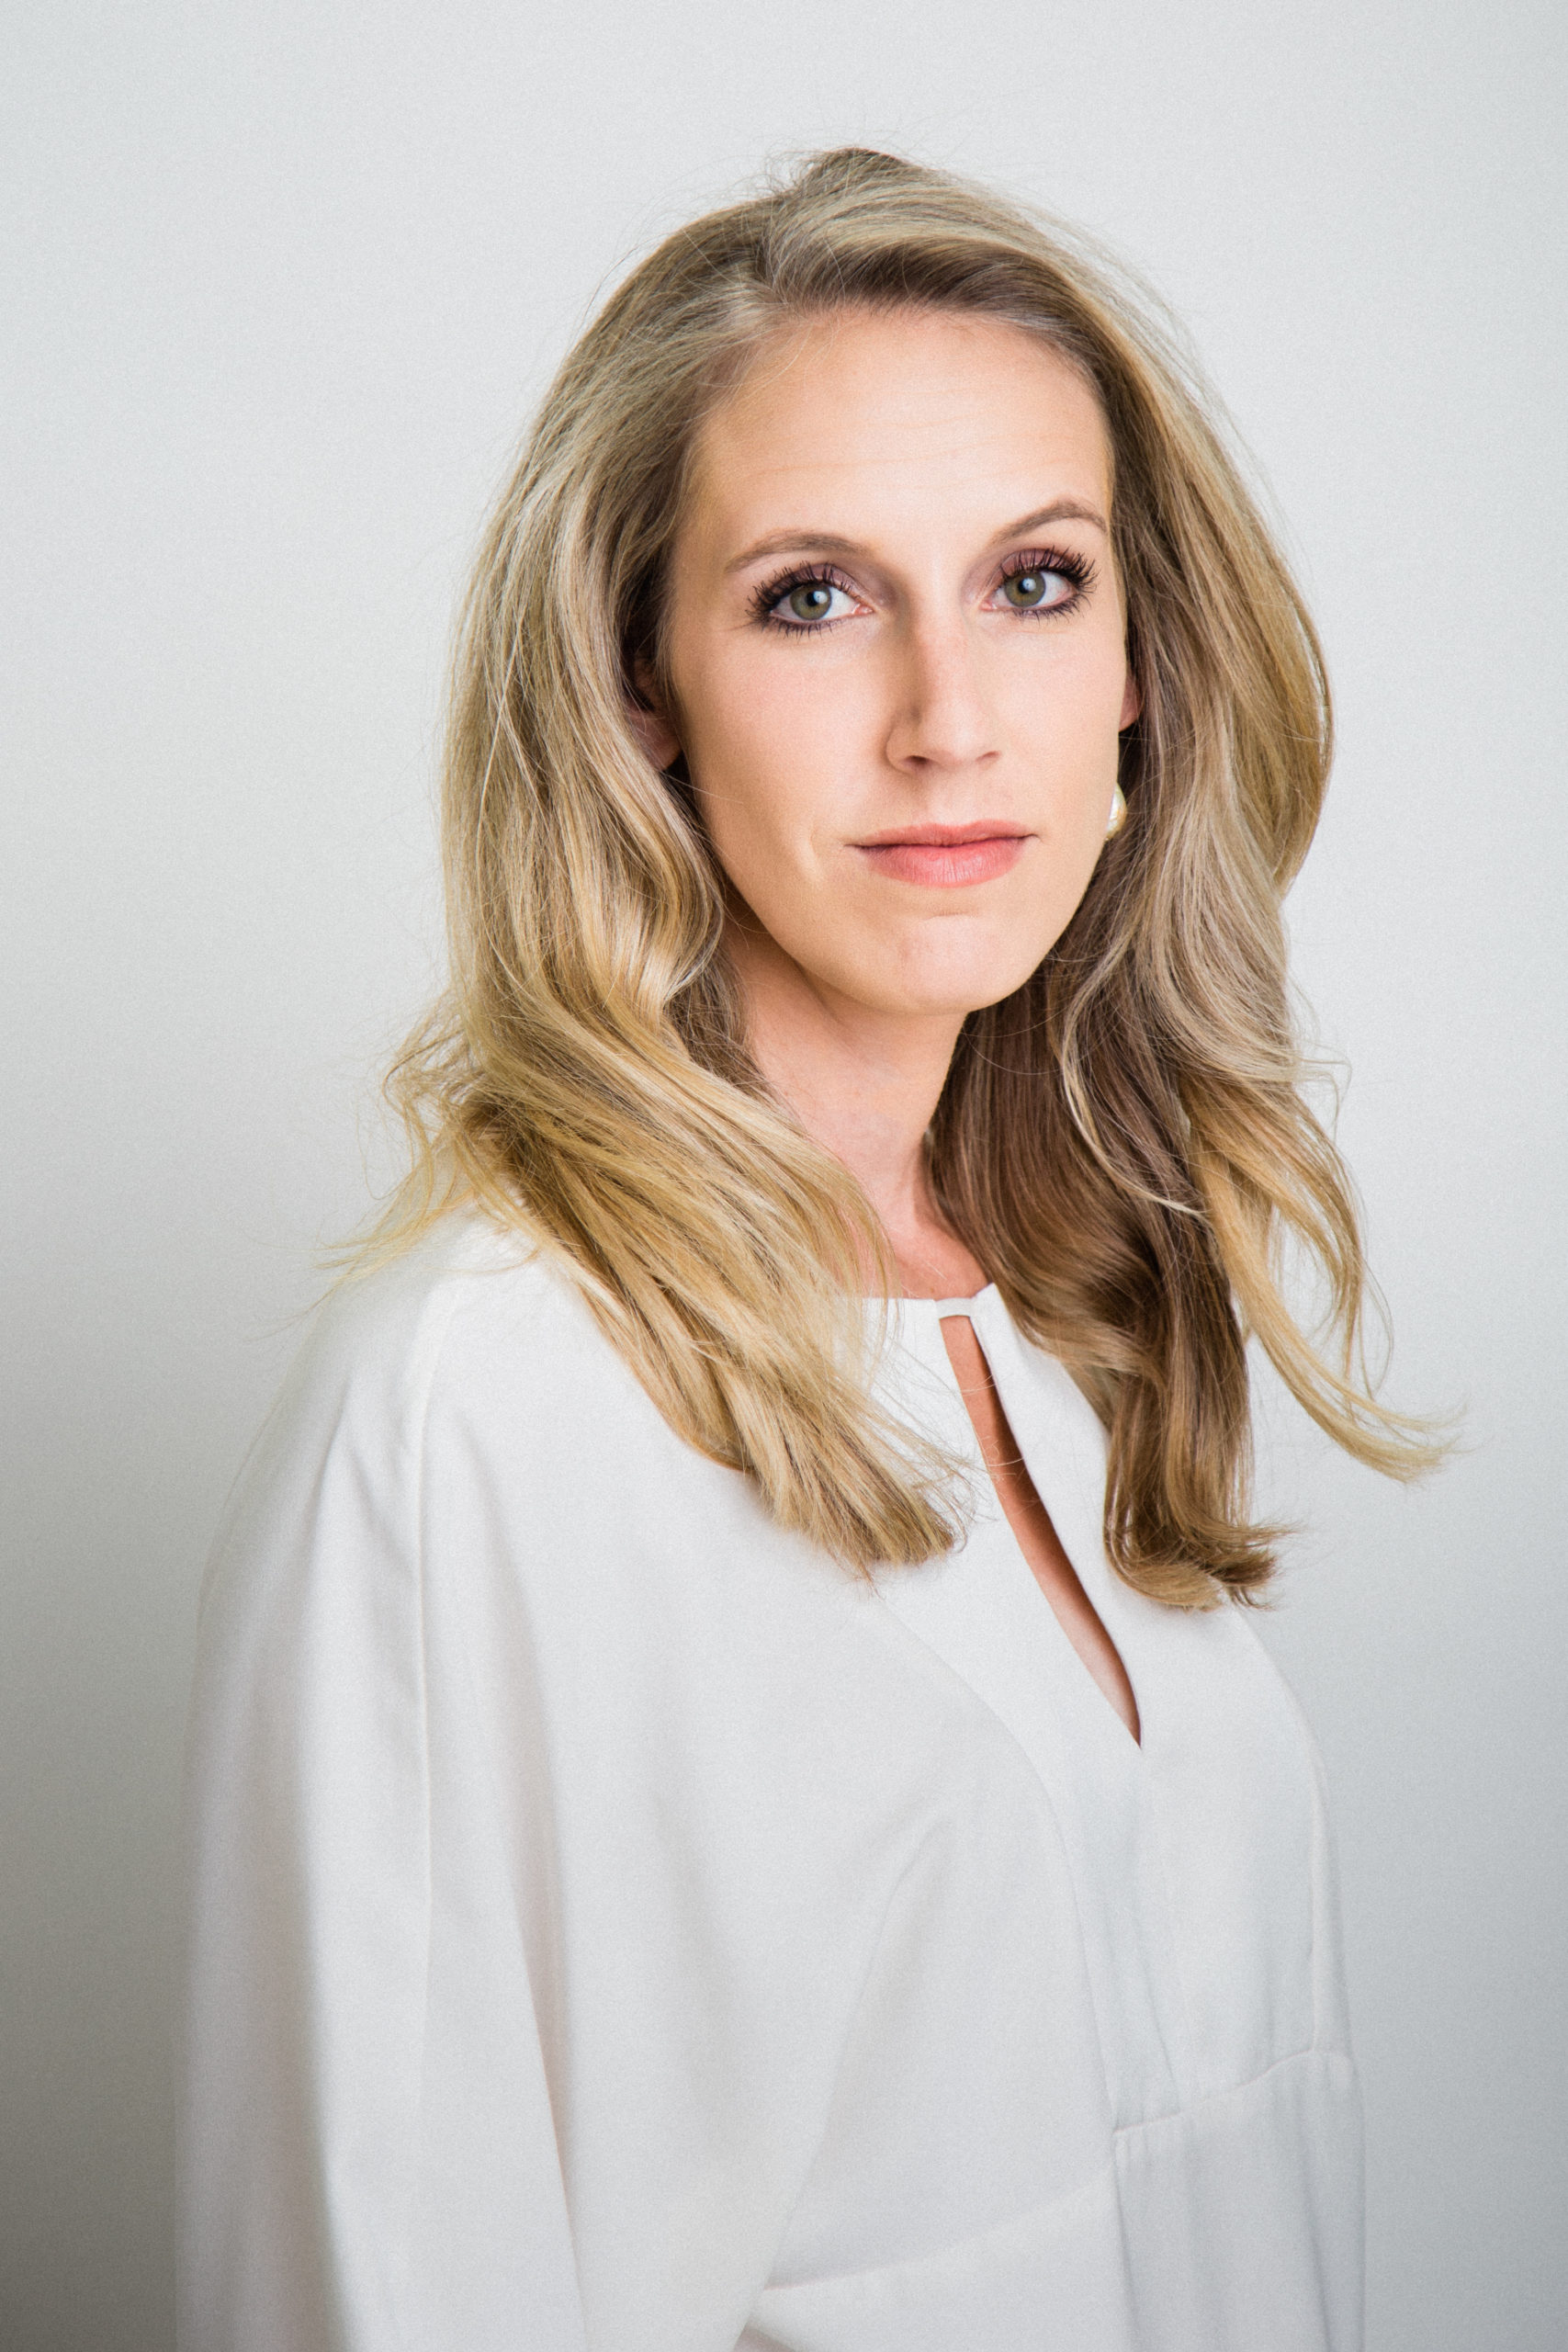 Rikki Hrenko Browing | 2020 Women of the Year